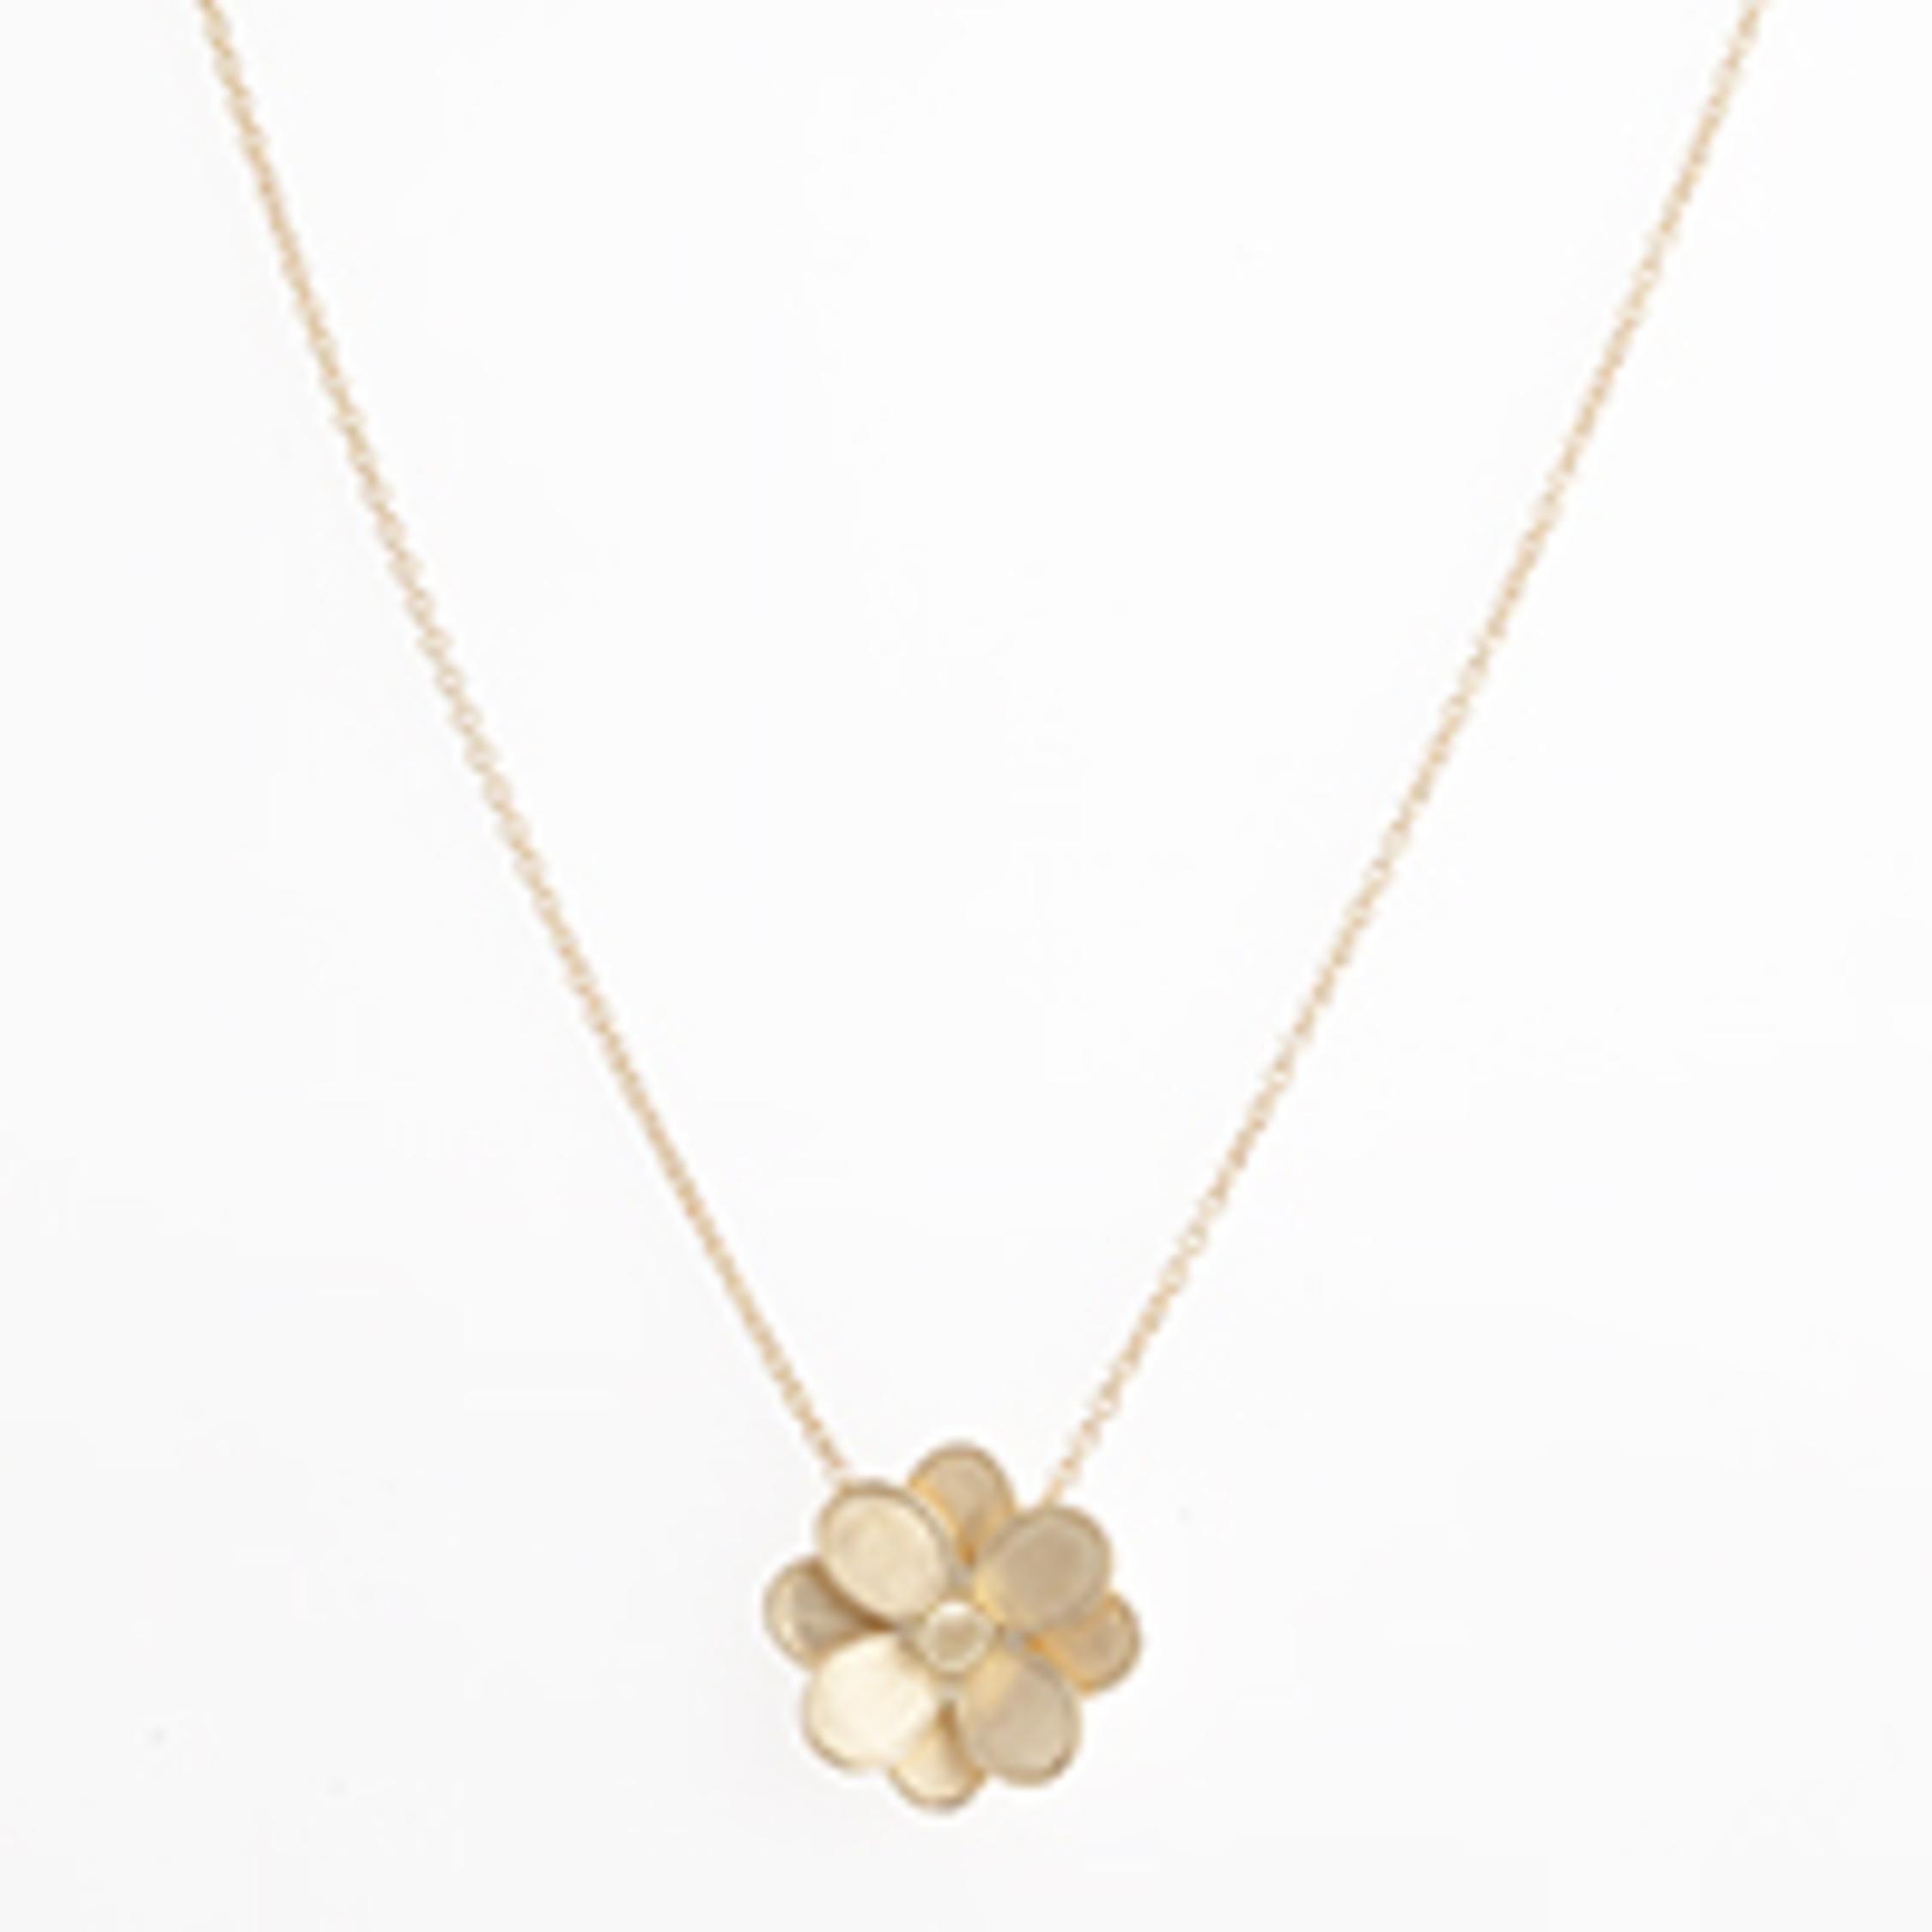 Petali Small Flower Pendant Necklace